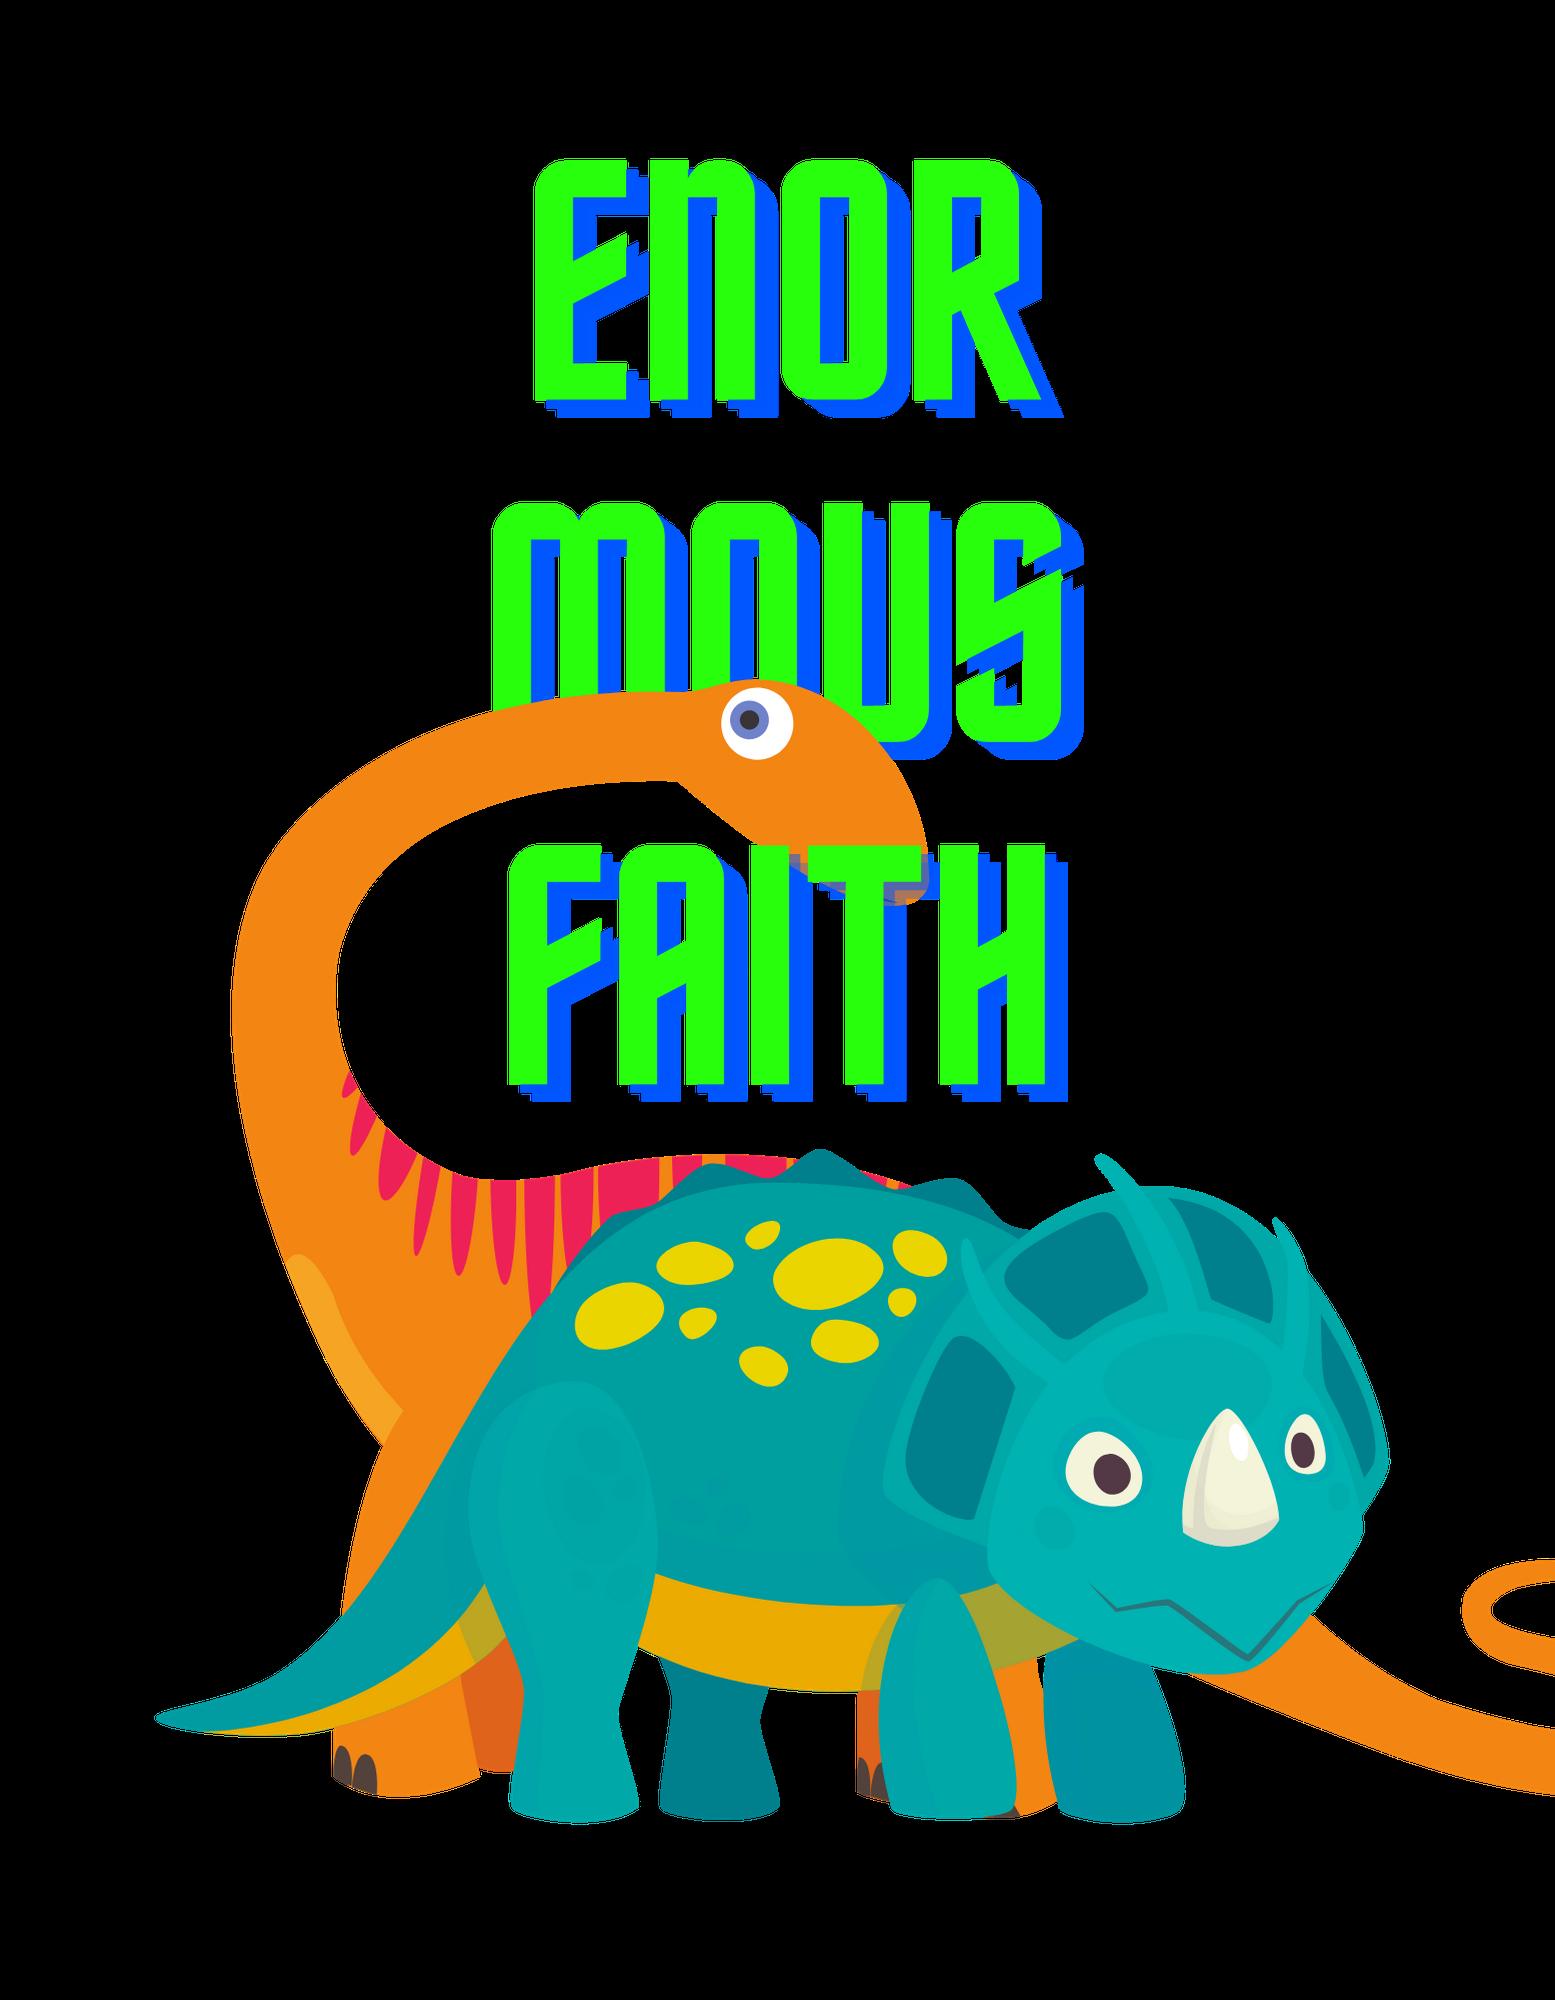 Enormous Faith (orange)